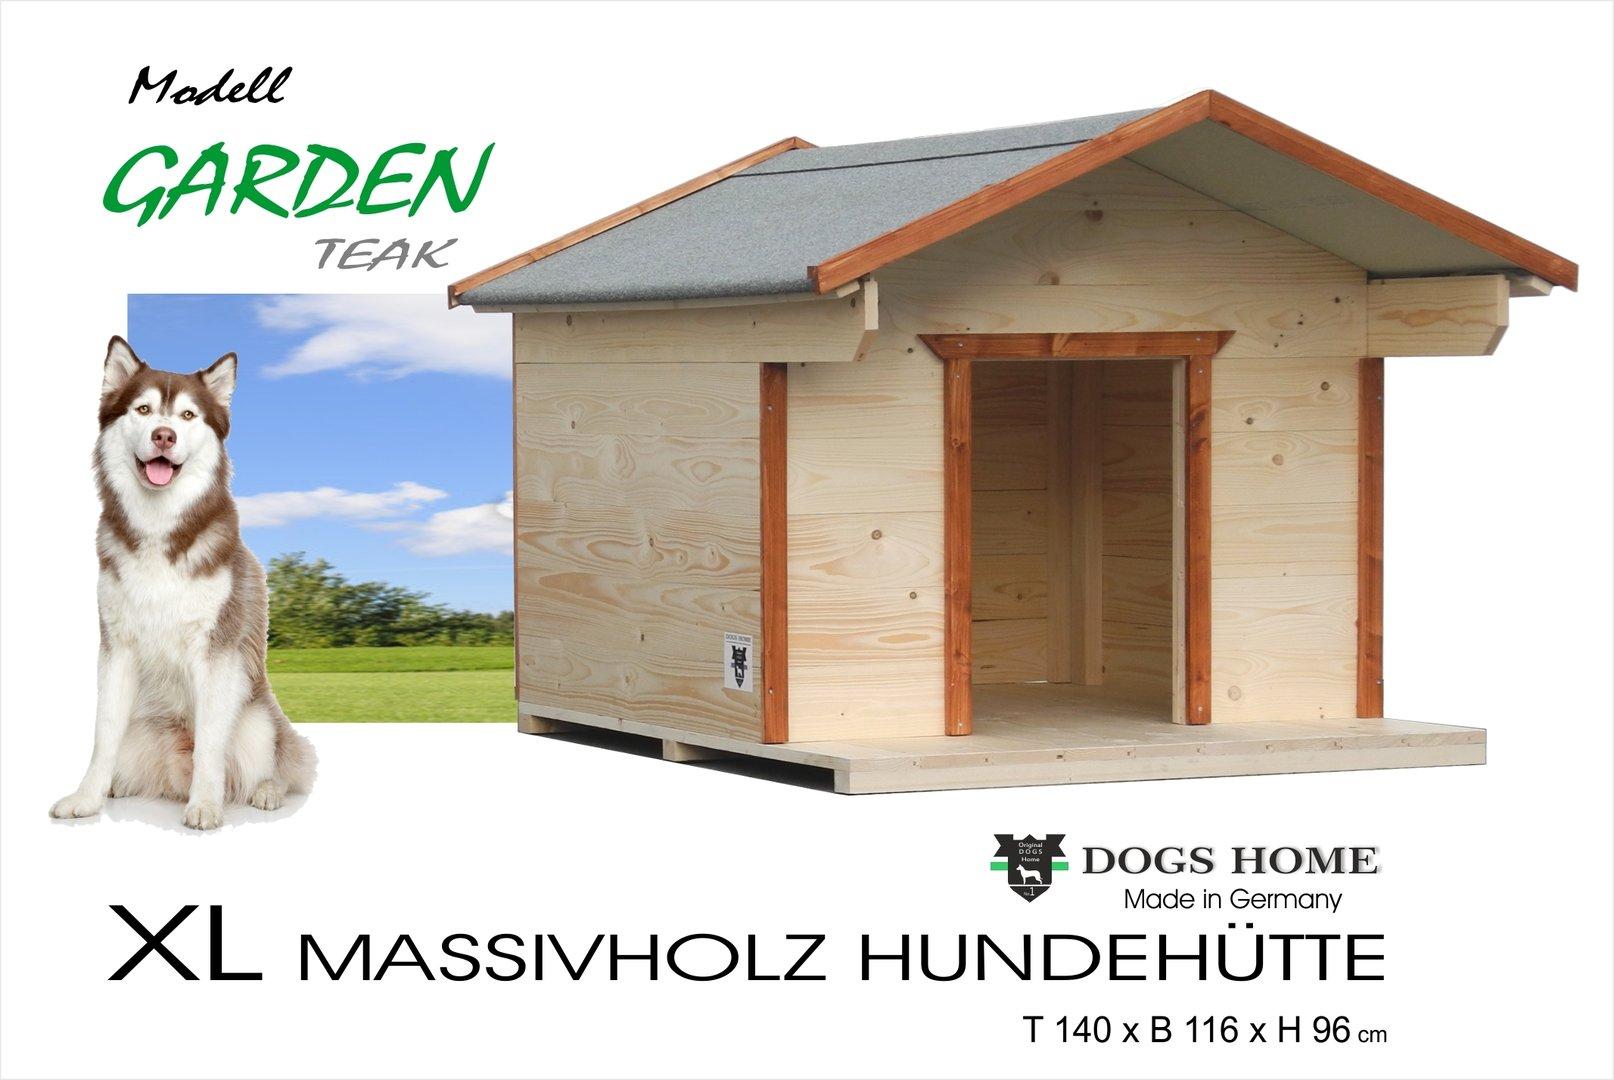 dogshome hundehütte garden teak xl outdoor wetterfest